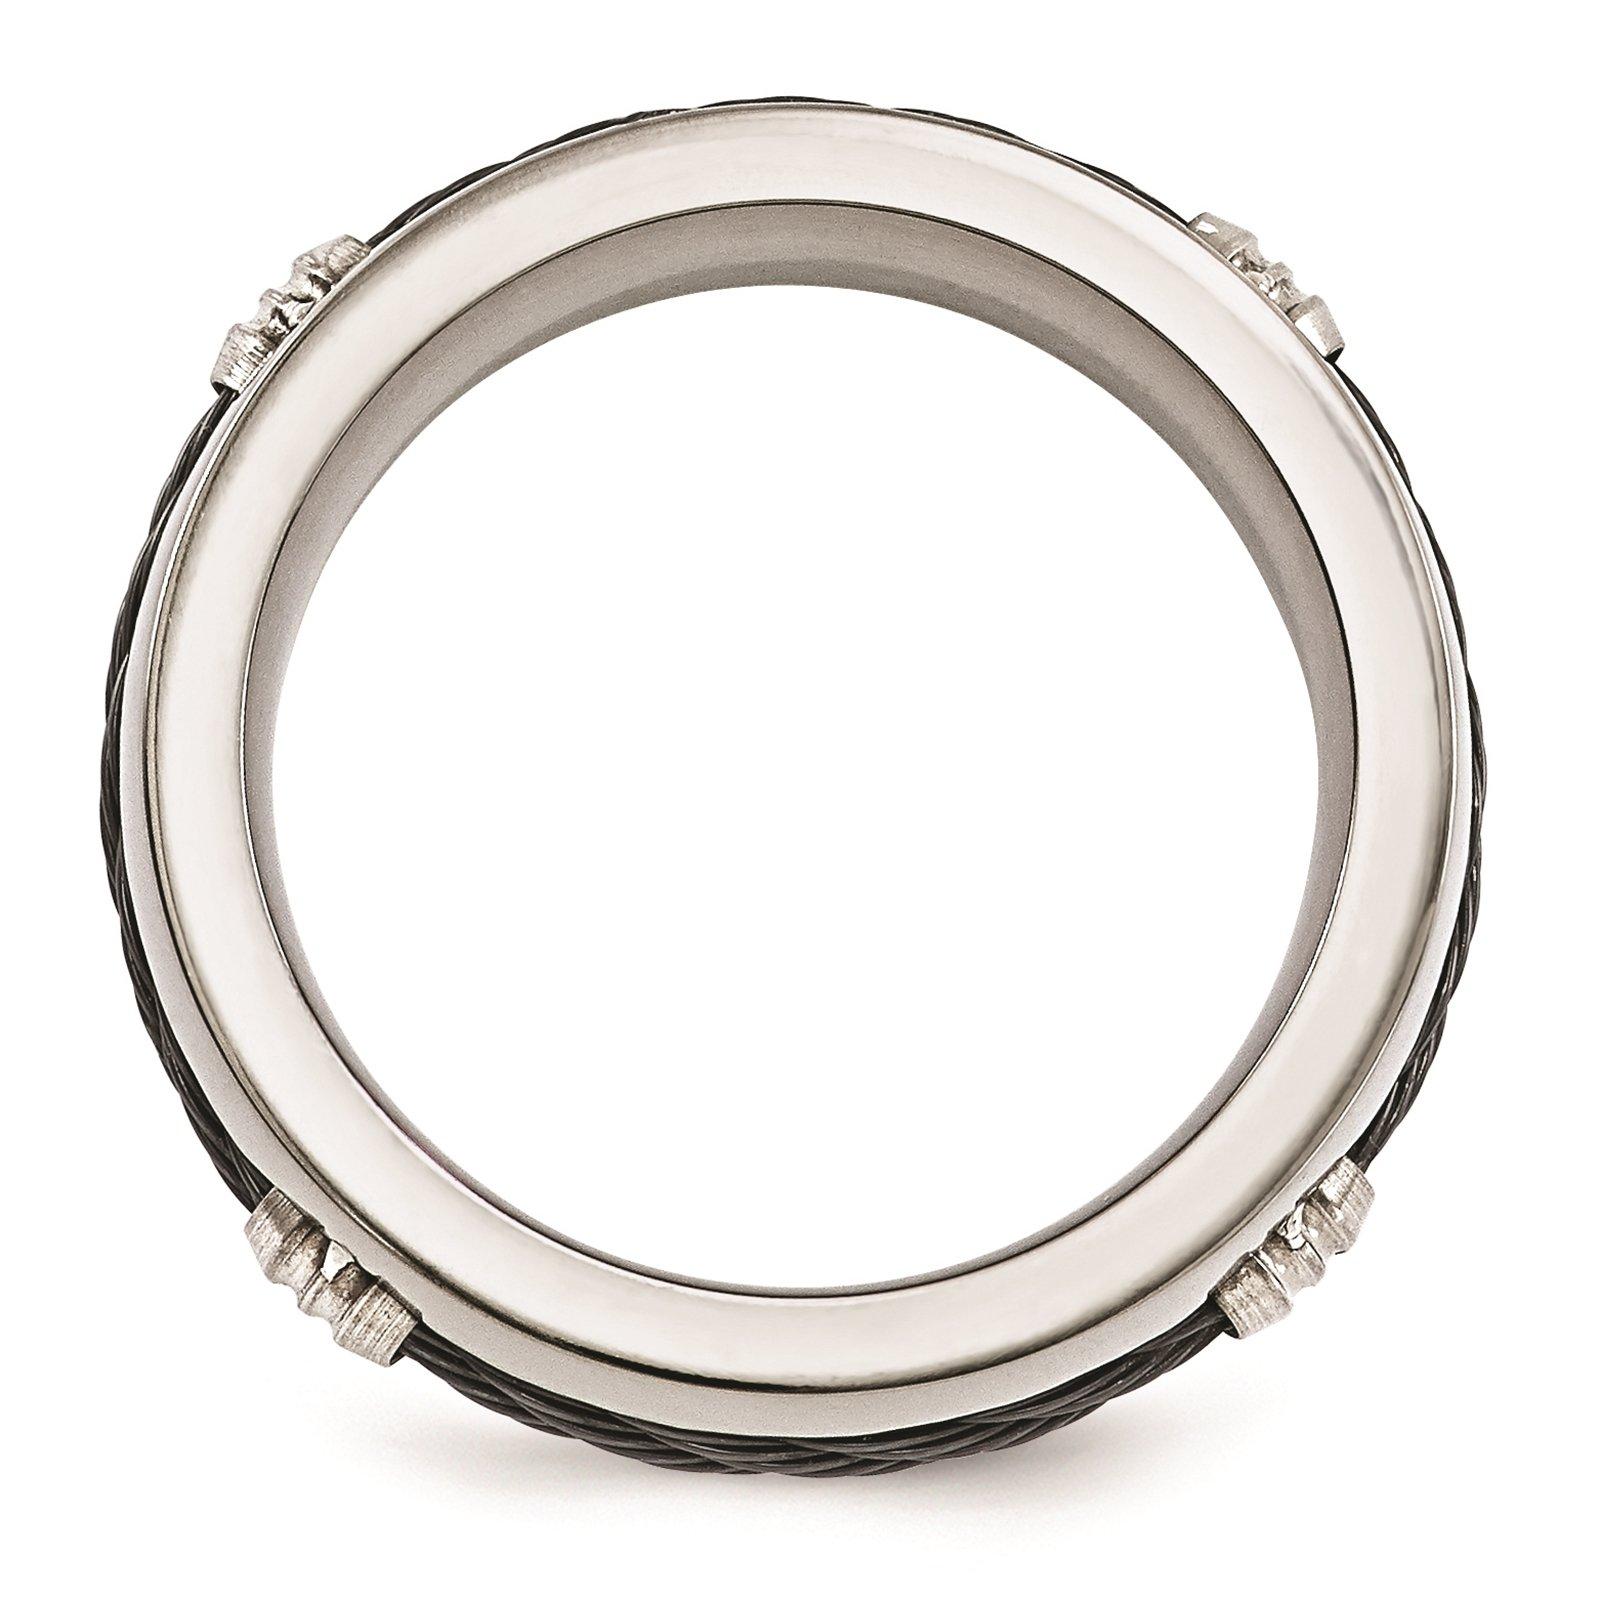 Titanium & Cable Polished 7mm Wedding Ring Band Size 8 by Edward Mirell by Venture Edward Mirell Titanium Bands (Image #2)